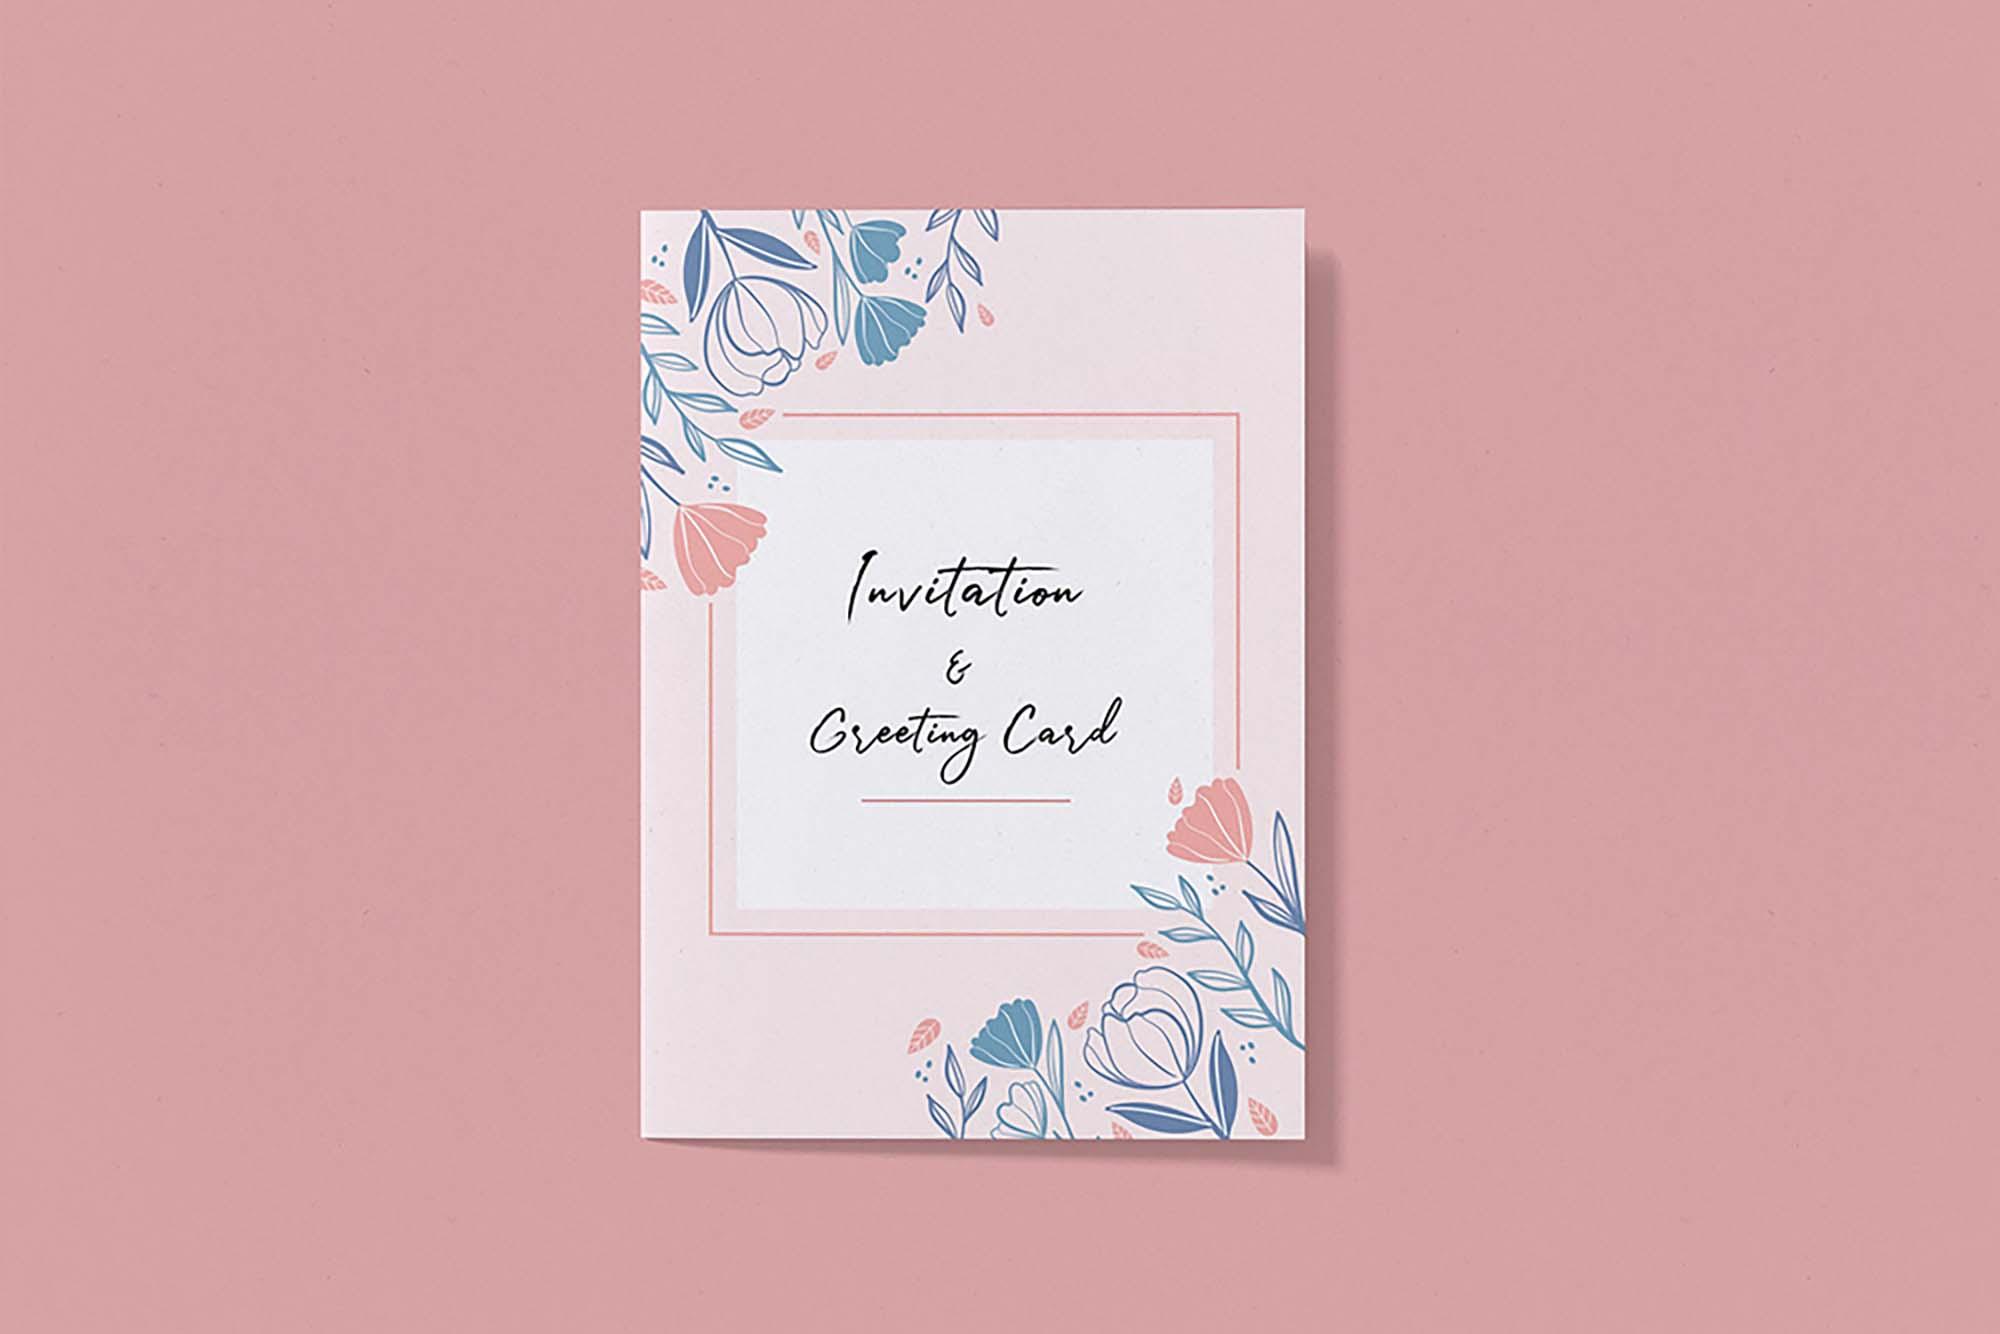 Free Invitation Greeting Card Mockup Psd